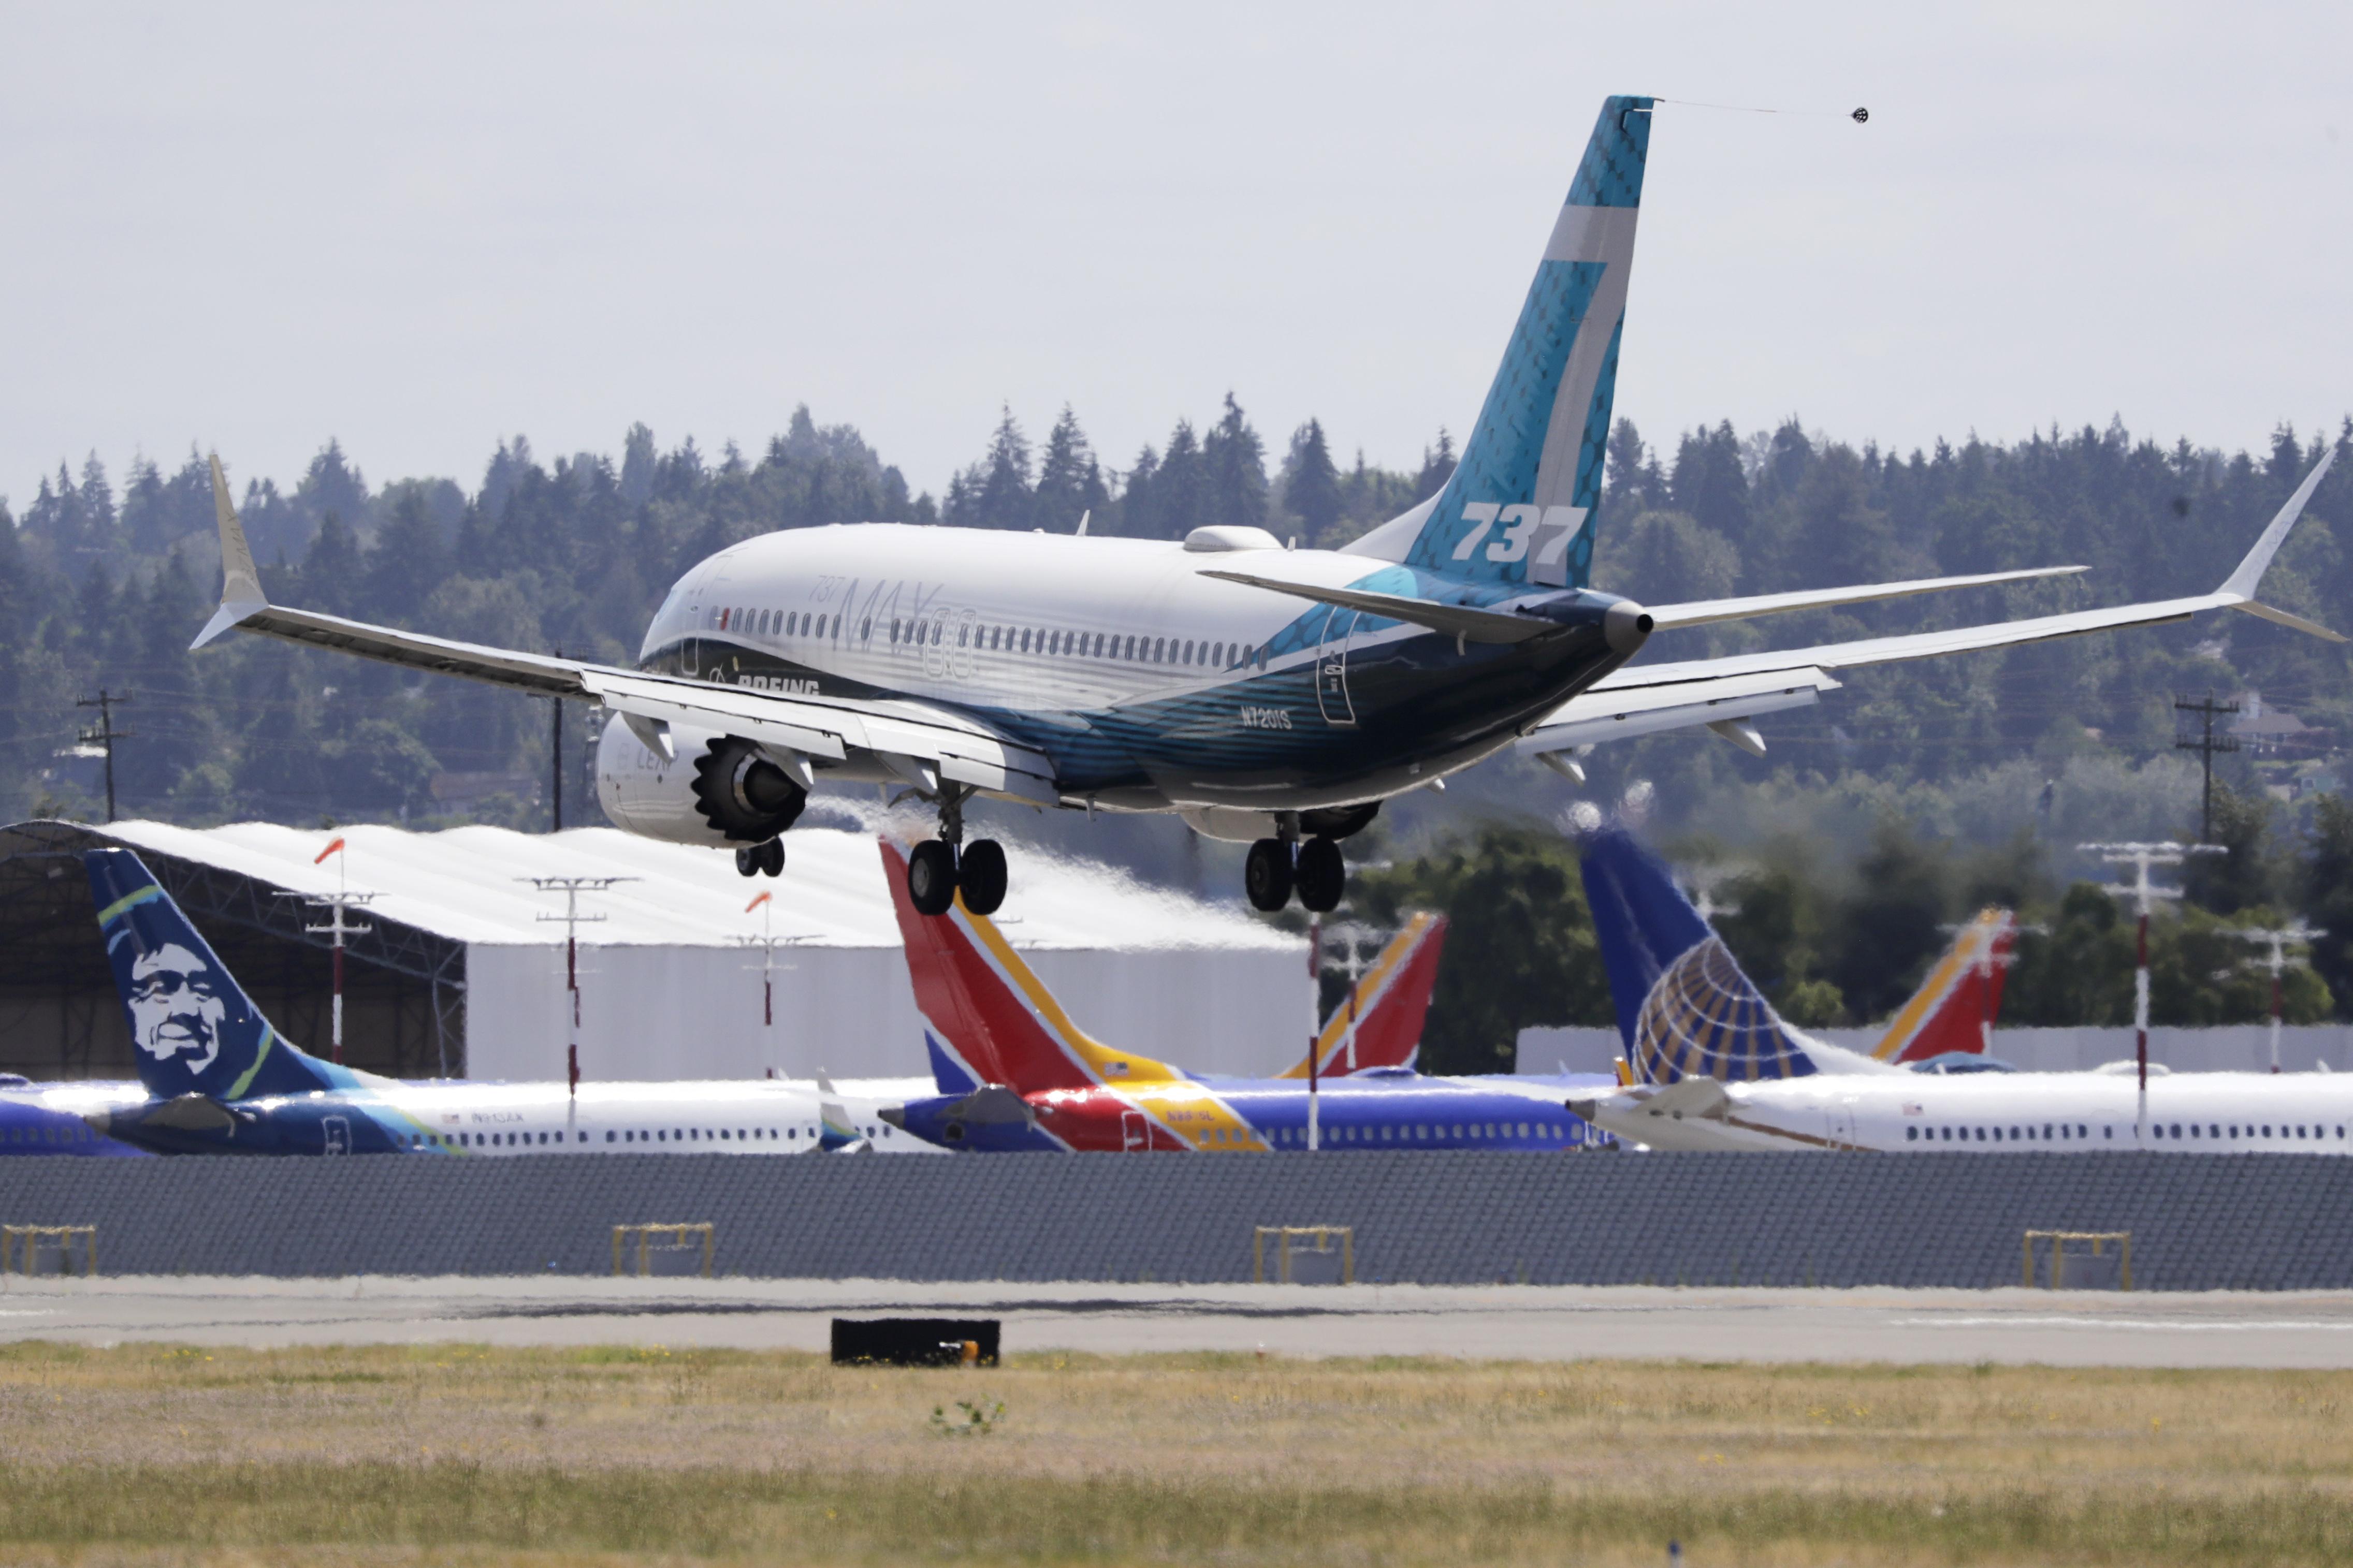 A Boeing 737 MAX jet lands behind a Boeing Field following a test flight in Seattle on June 29, 2020.